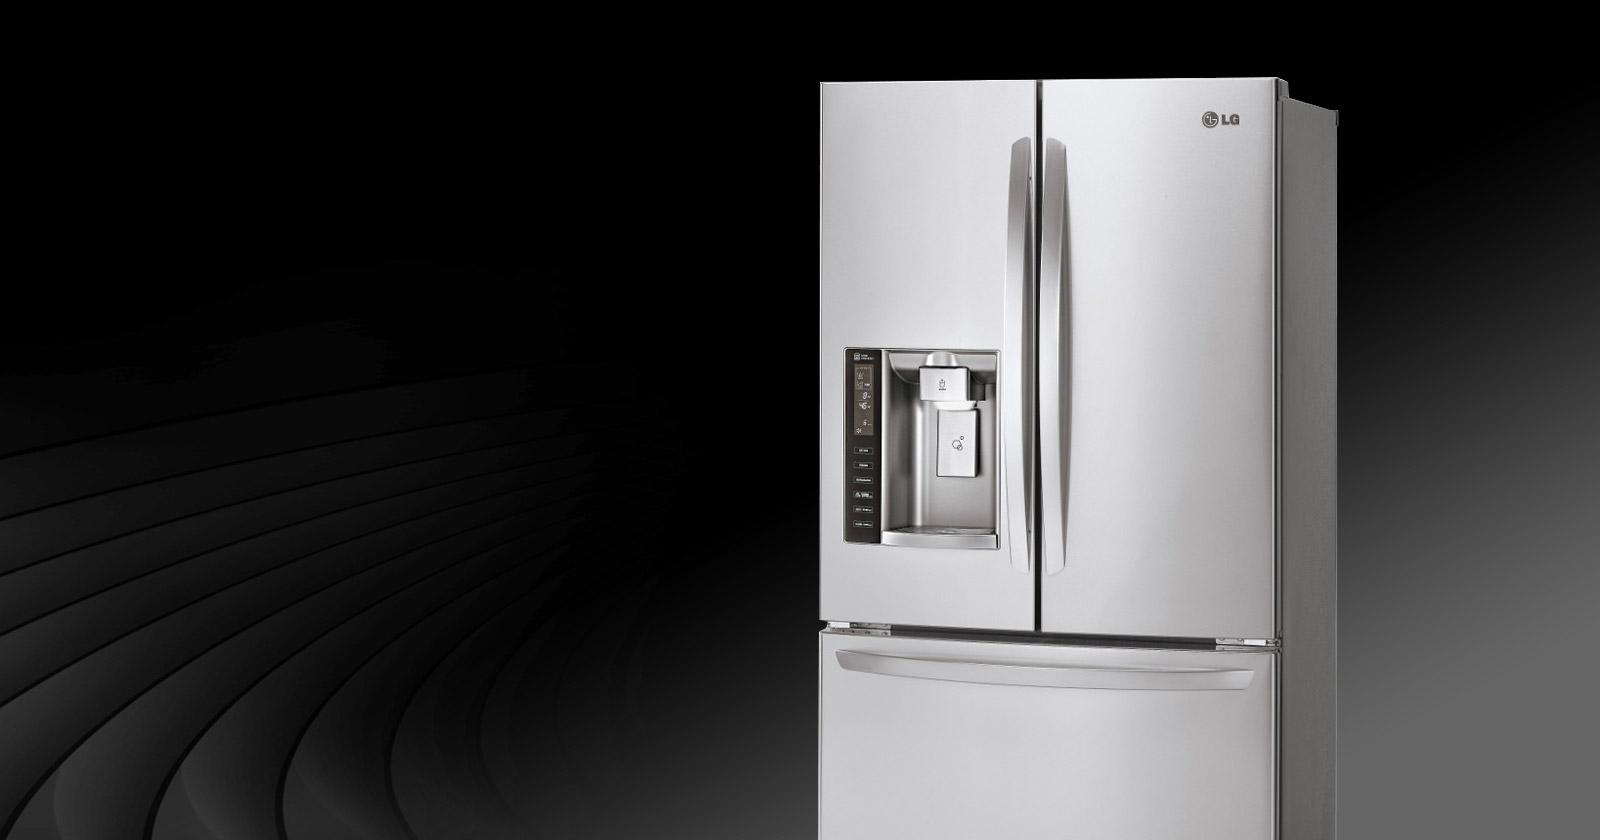 Best 62 Refrigerator Background on HipWallpaper Refrigerator 1600x840